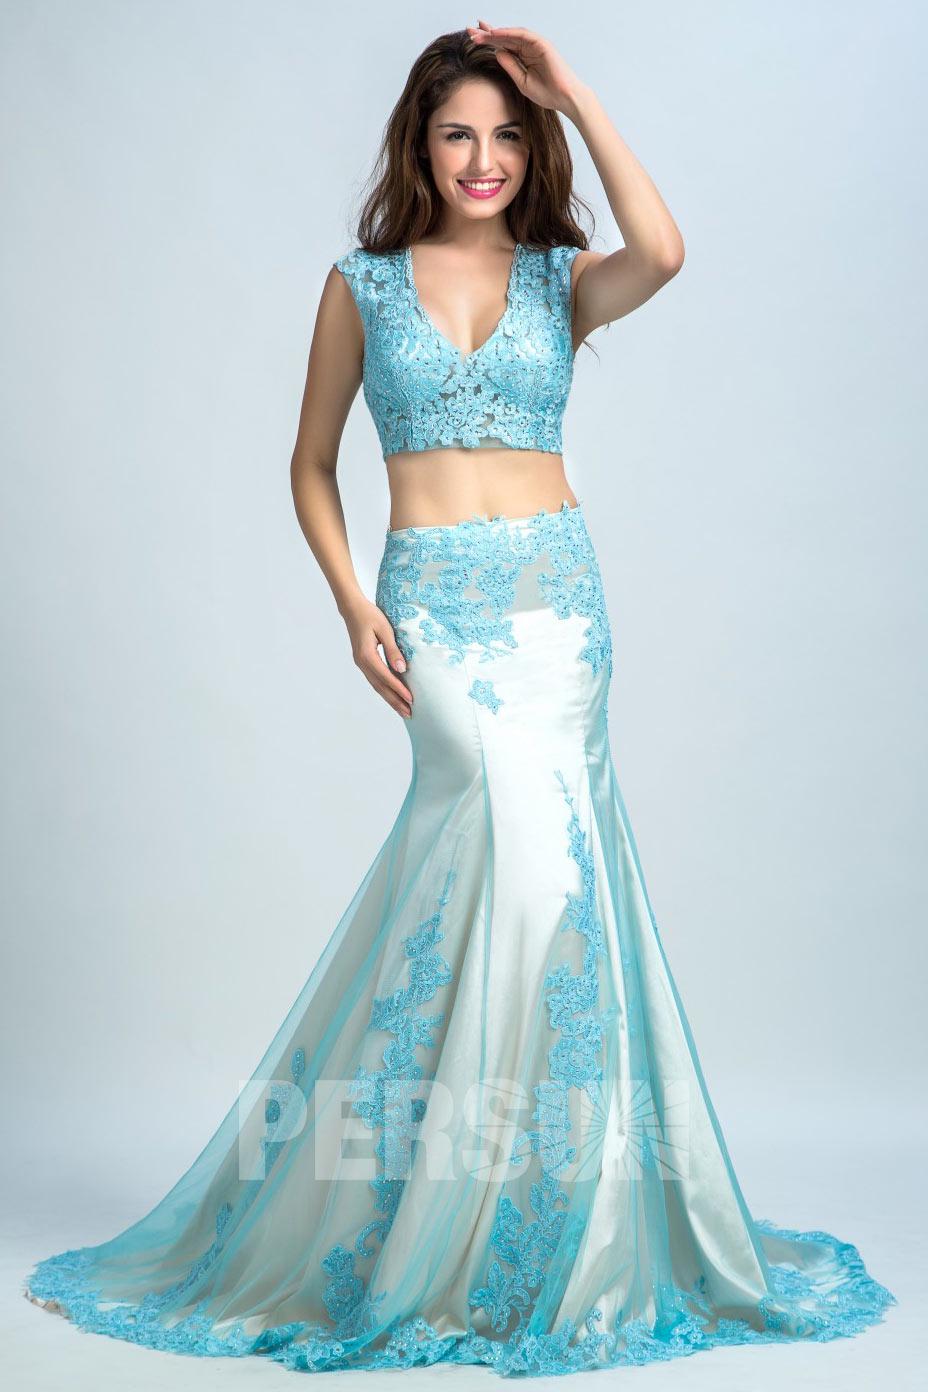 Meerjungfrau-Stil V-Ausschnitt Pinsel-Schleppe Spitze Sticheln Perle hell blau Ballkleid lang